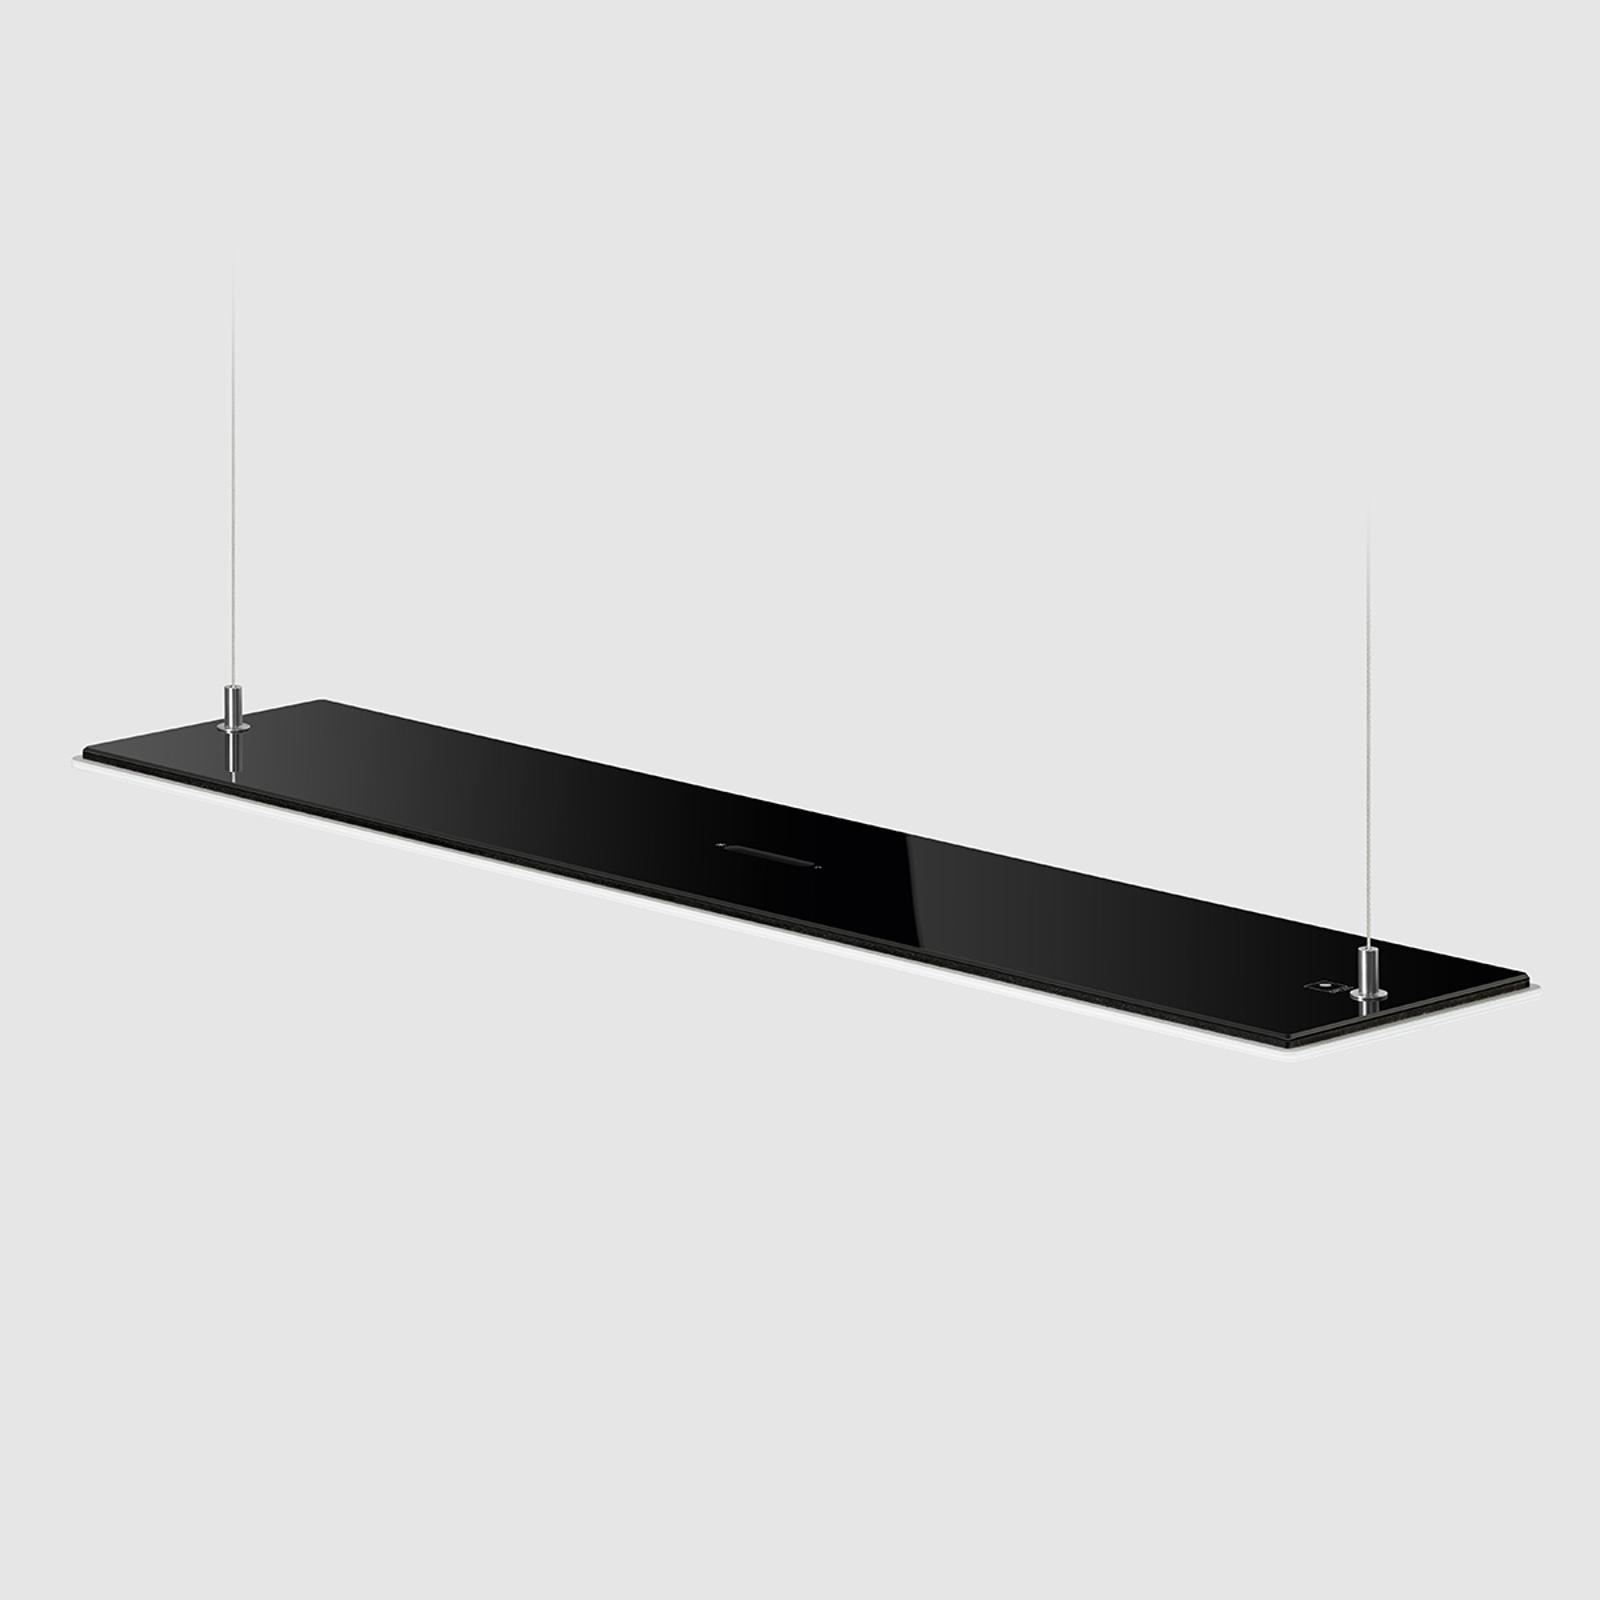 Schwarze OLED-Hängeleuchte OMLED One s5